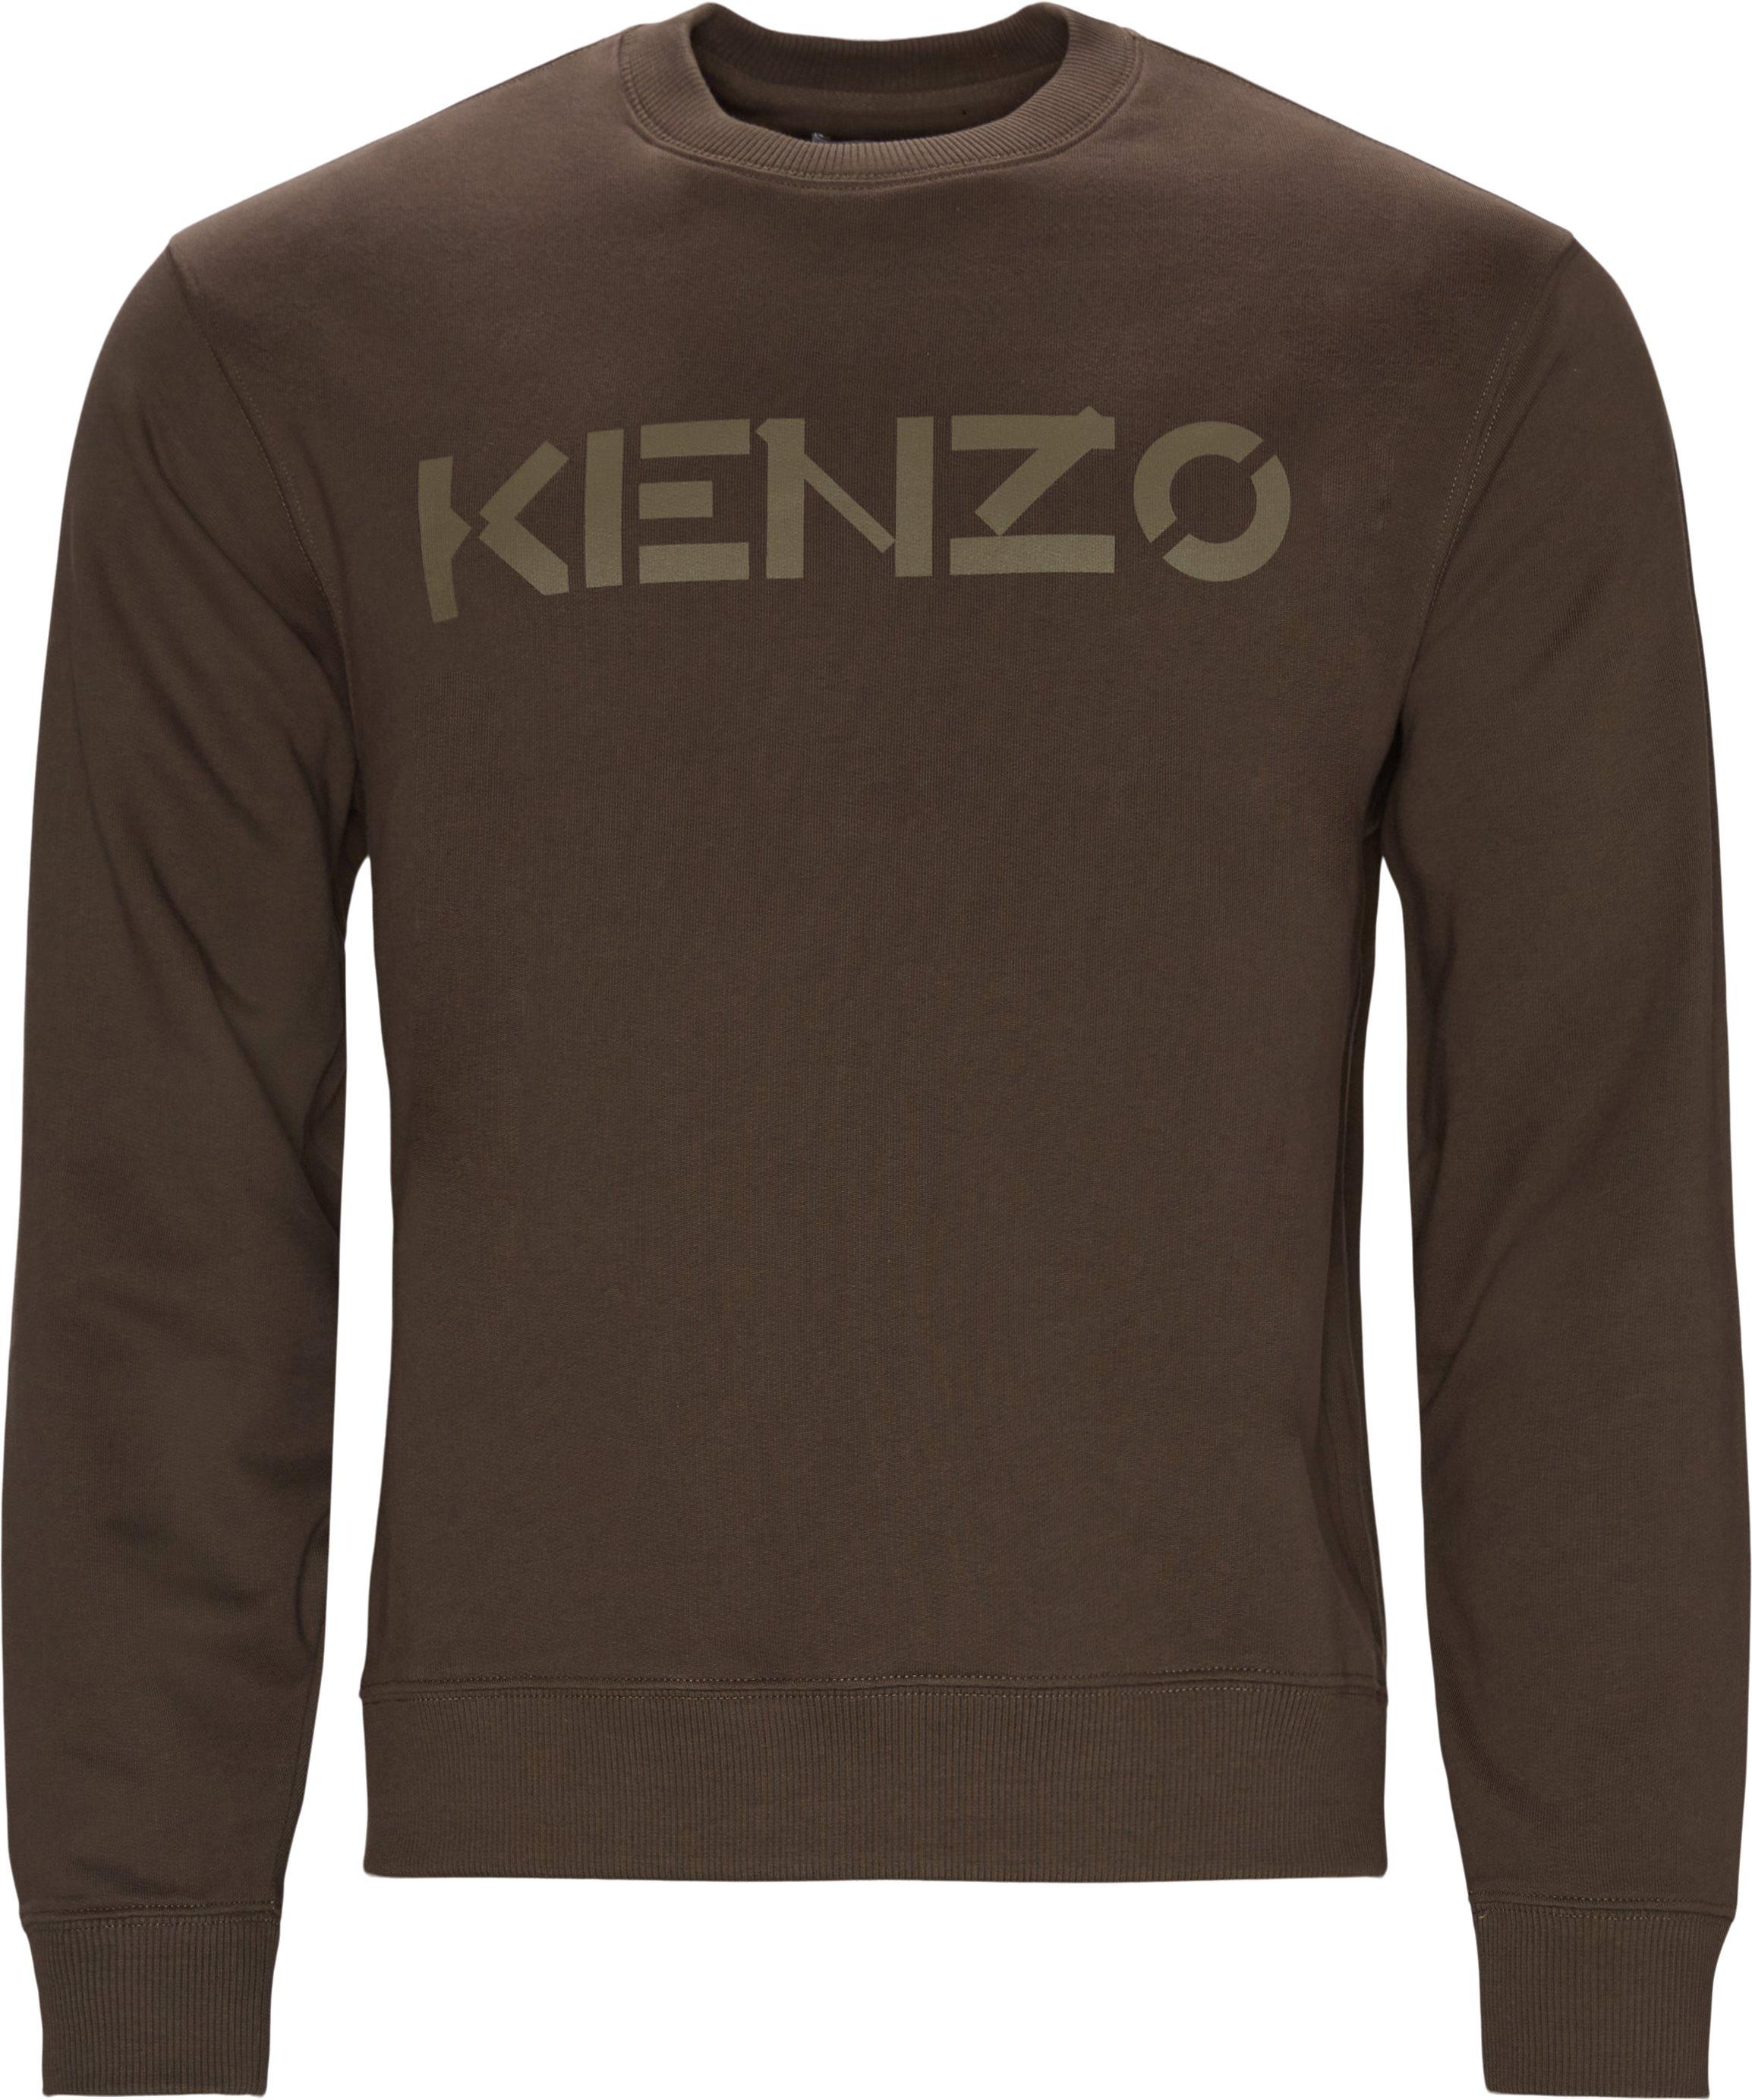 Sweatshirts - Regular fit - Brown